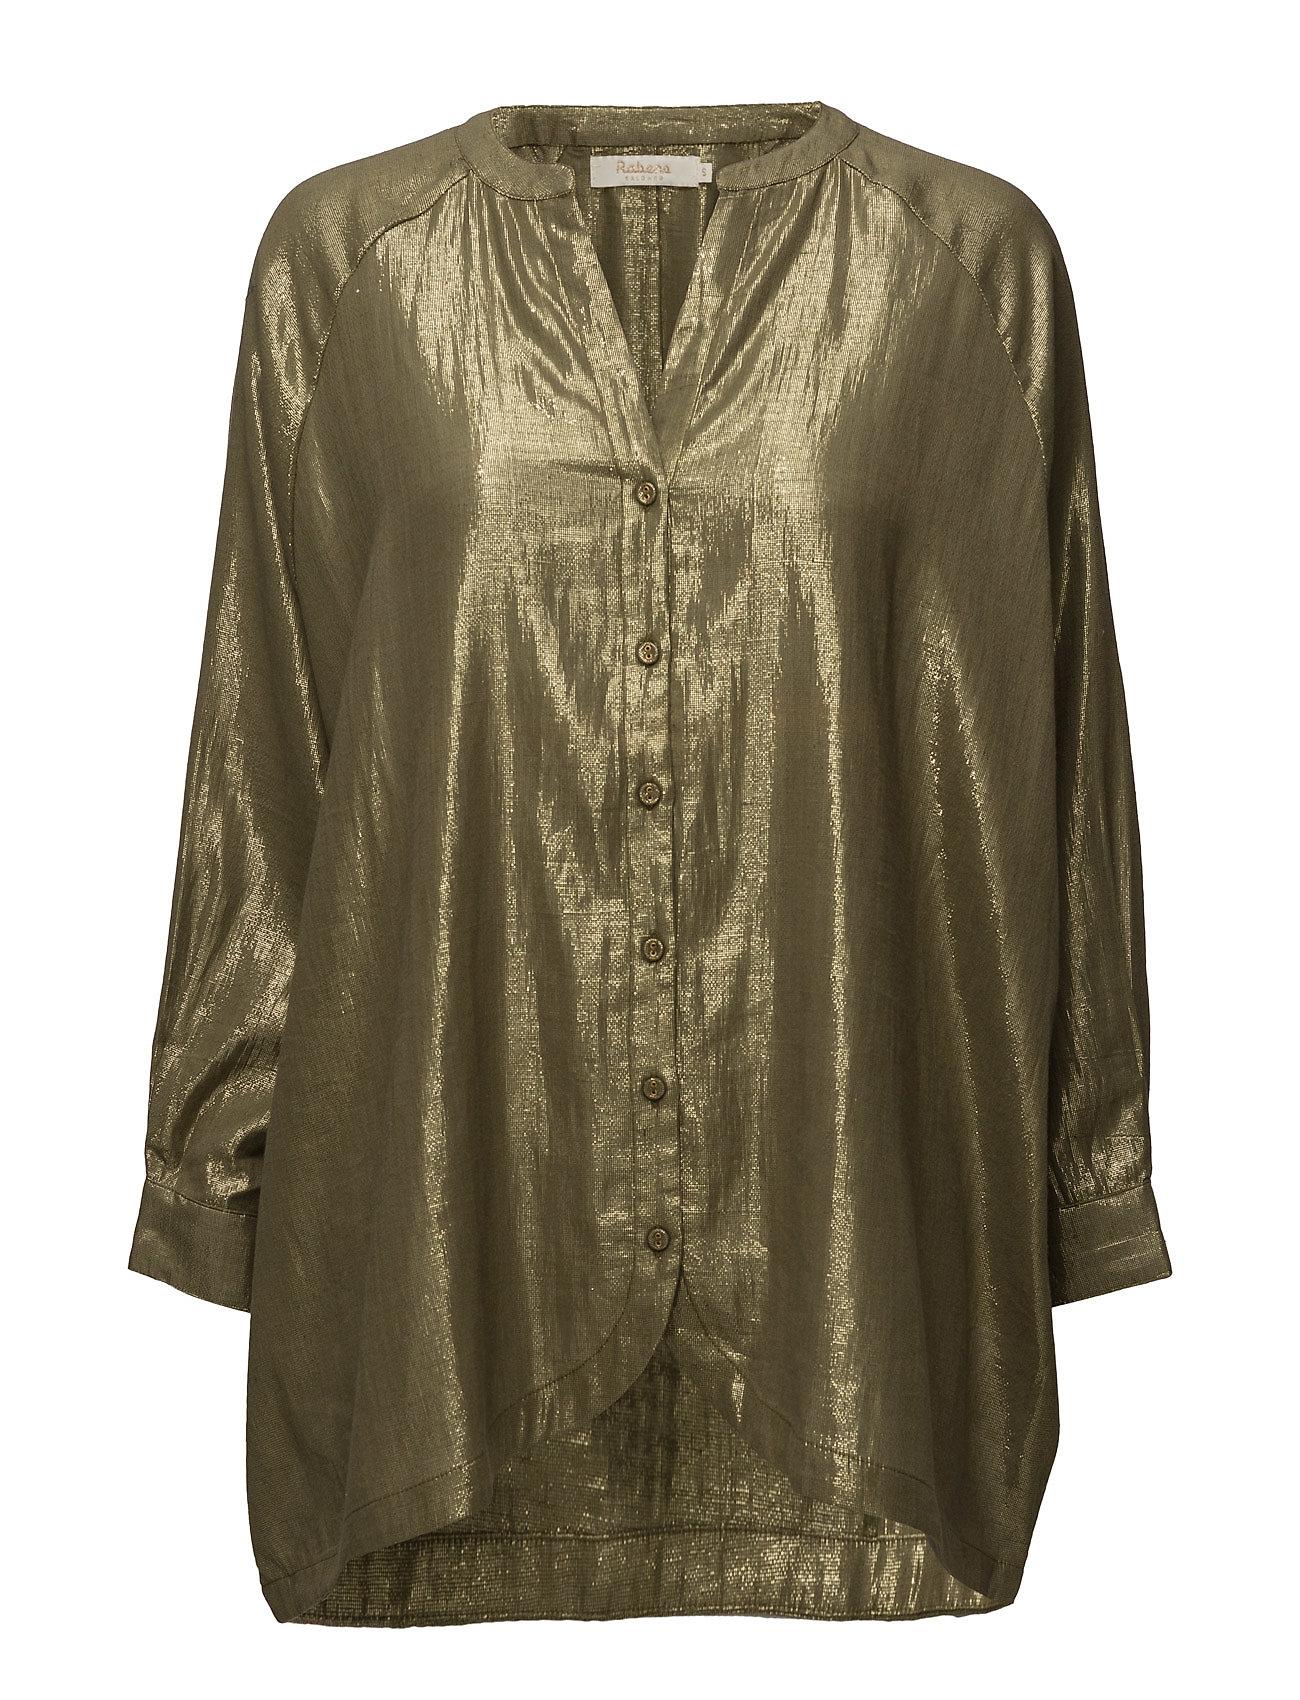 rabens saloner Golden long sleeve shirt fra boozt.com dk